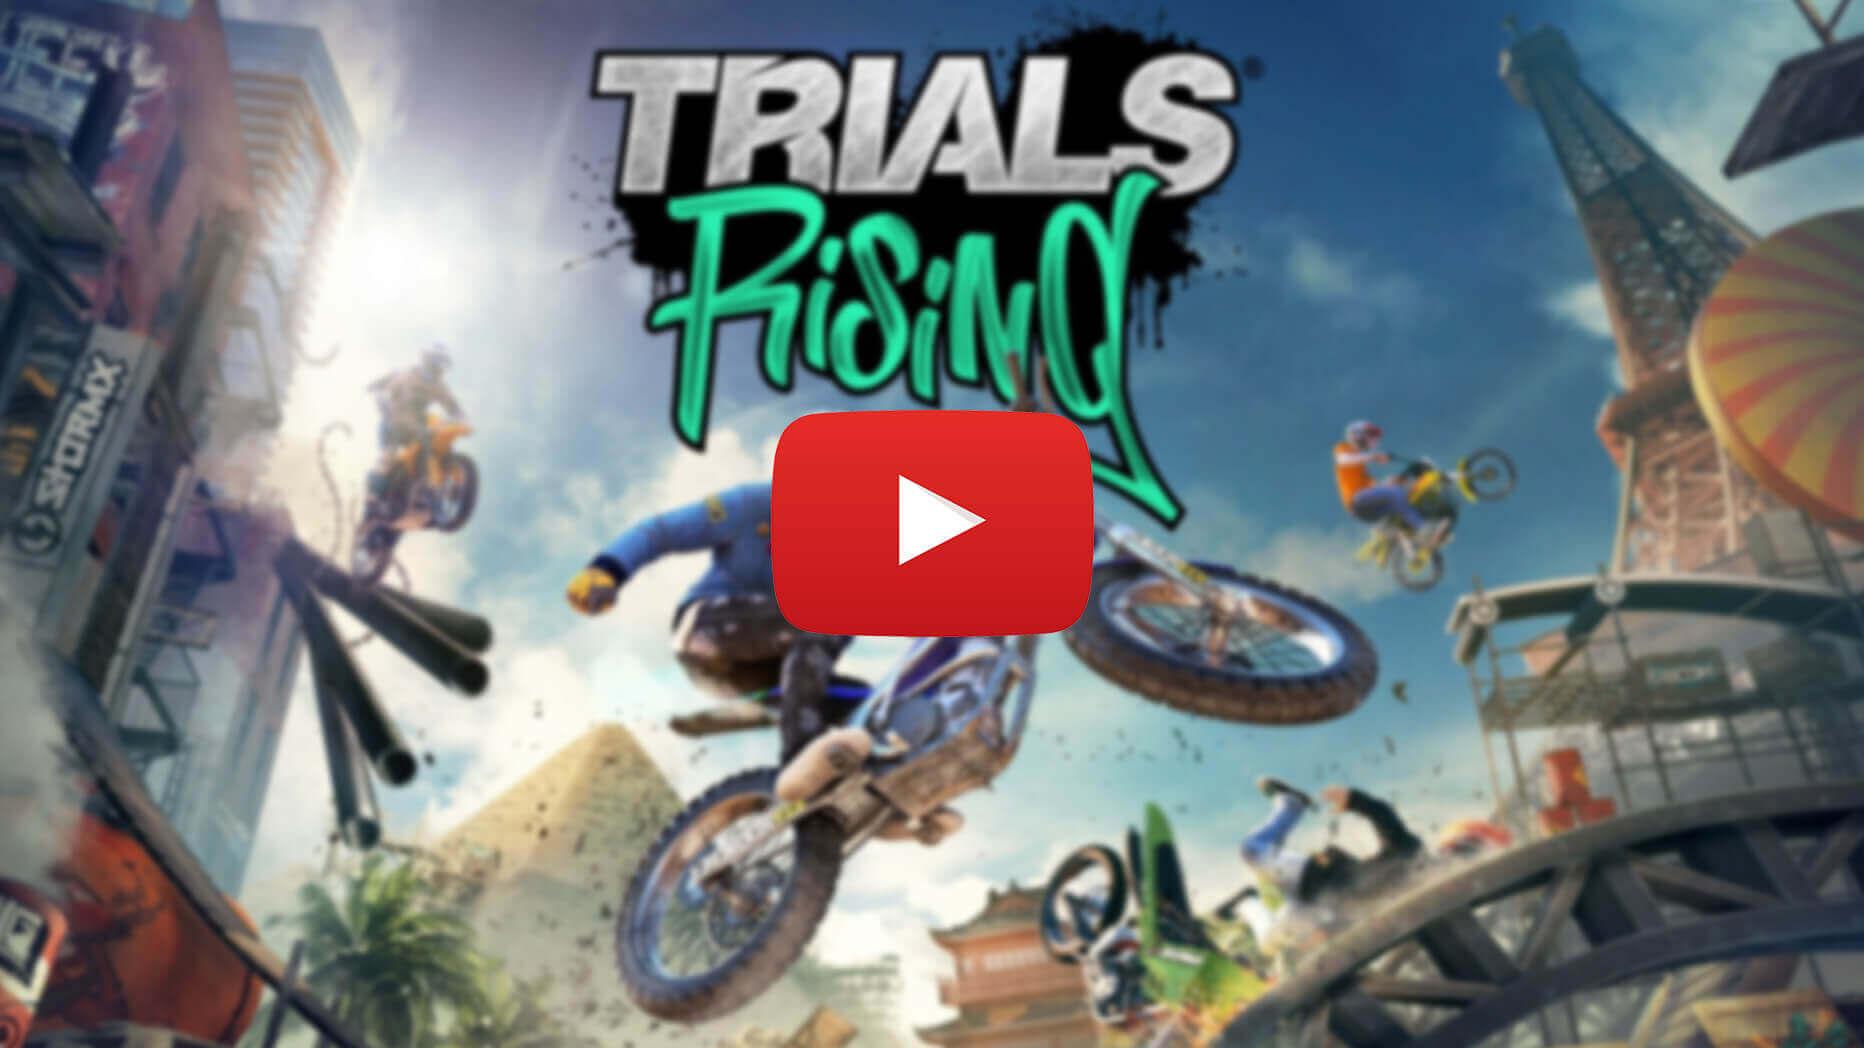 TrialsVideo